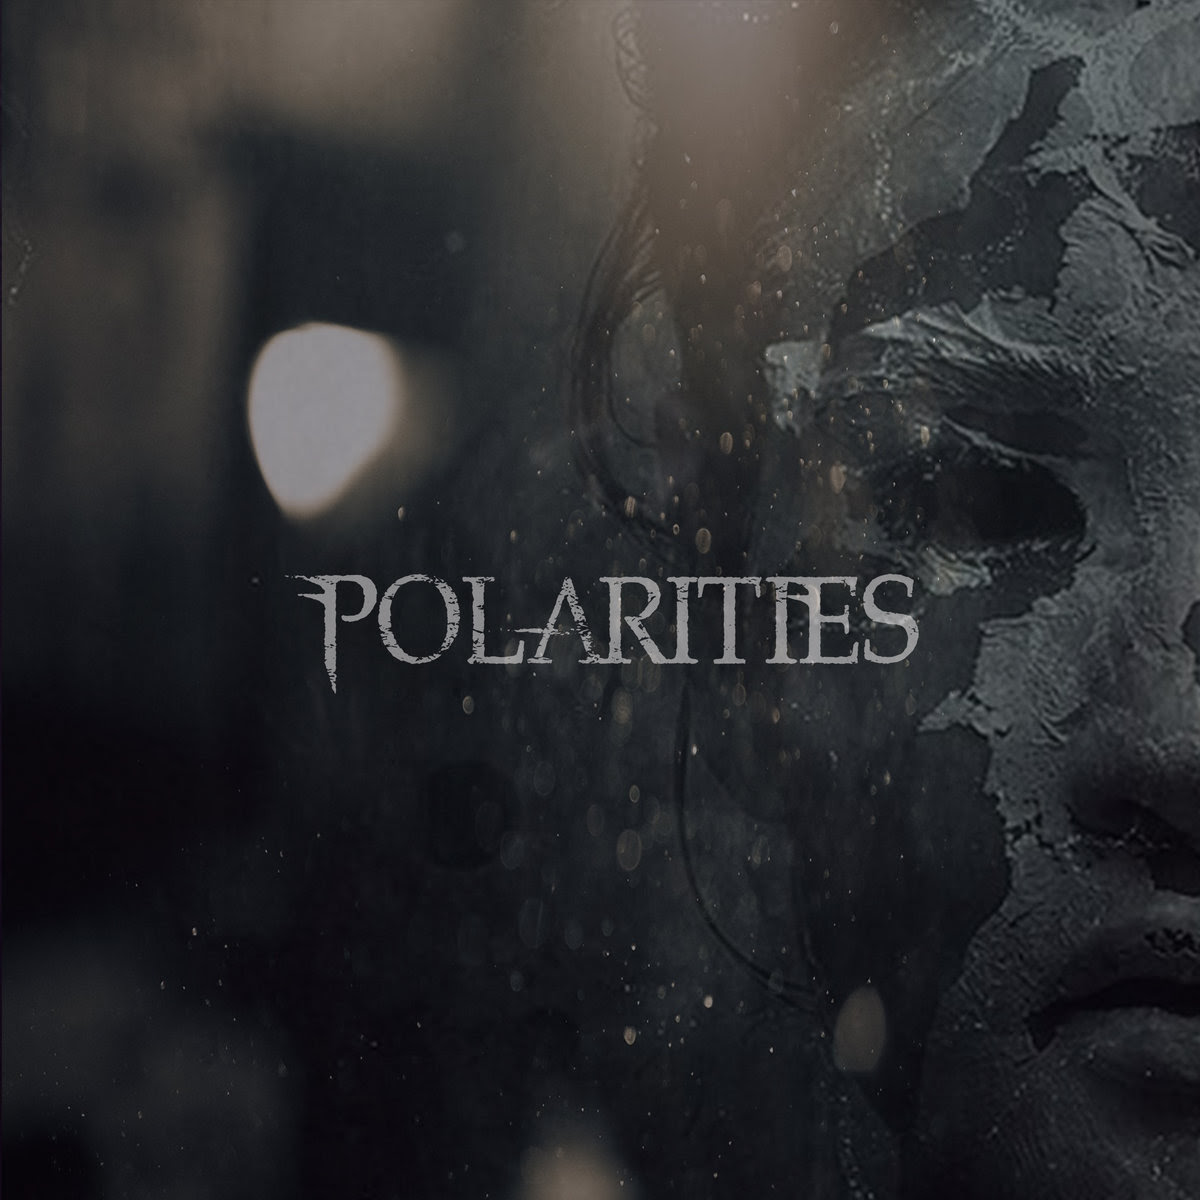 www.facebook.com/polaritiesil